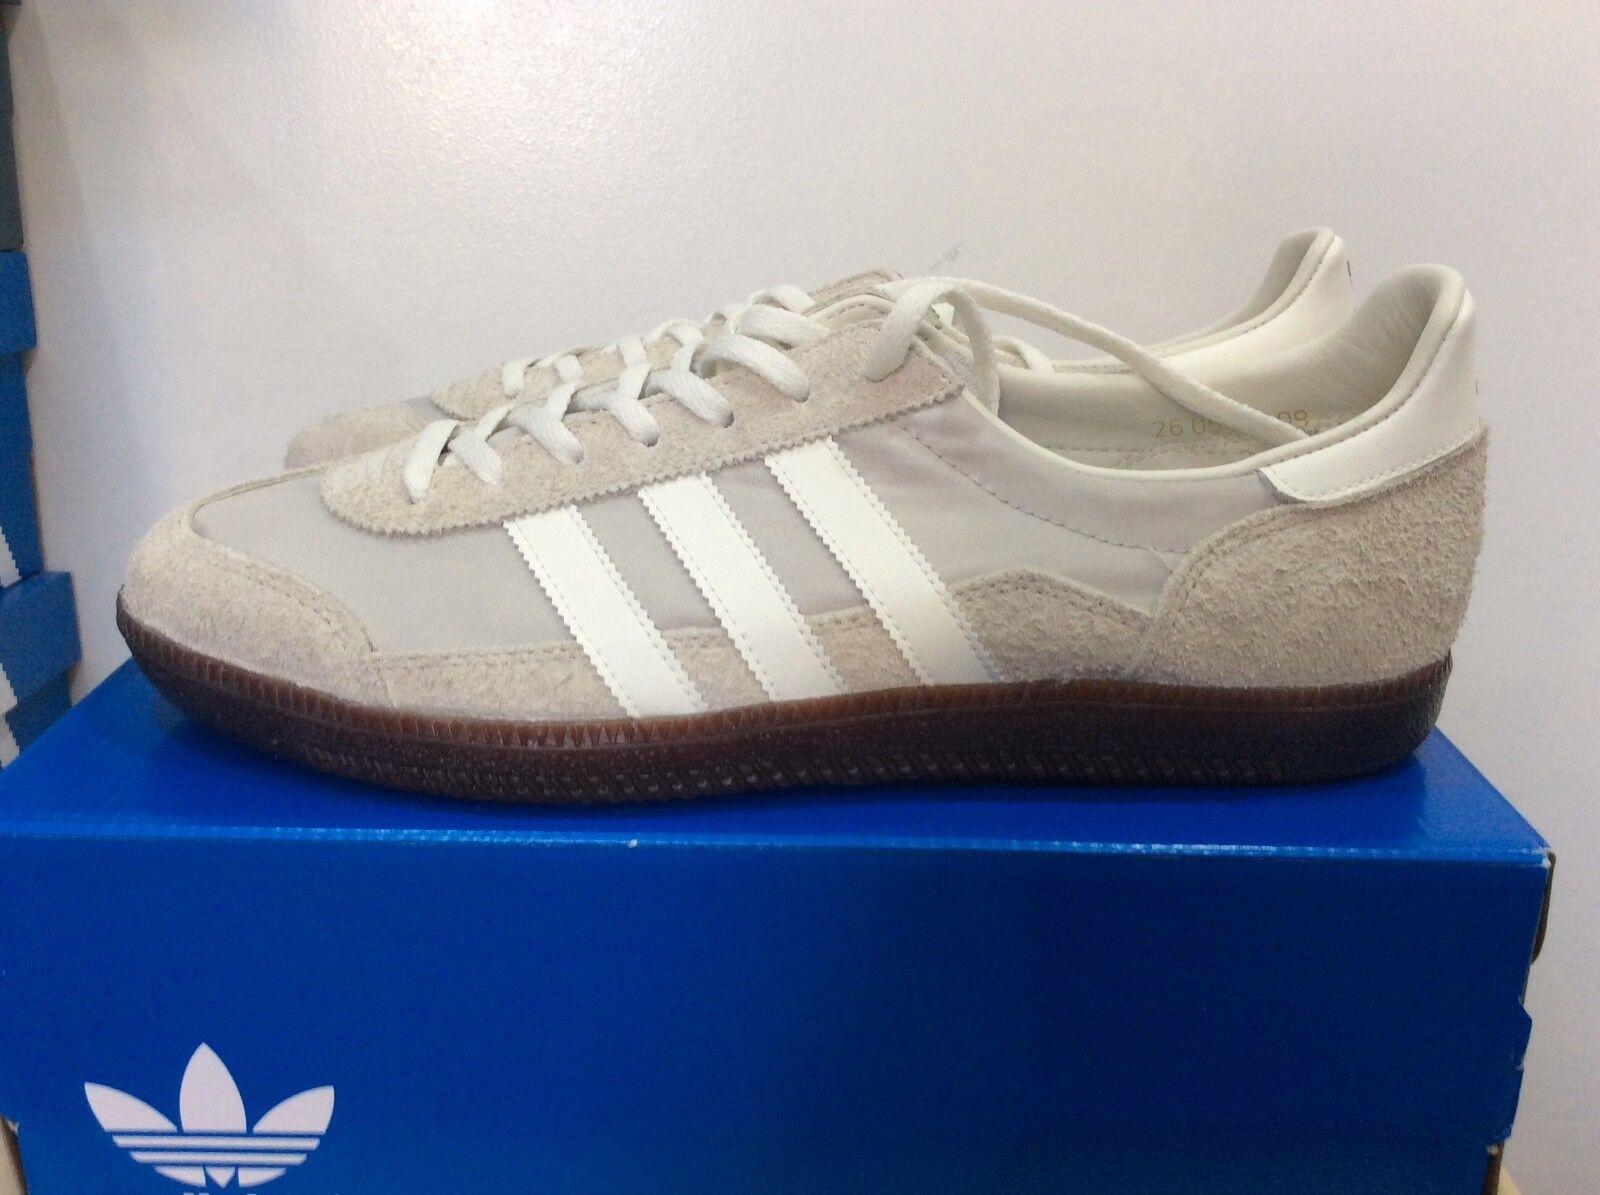 Adidas Wensley spezial  2017, Size Uk 10, brand New In Box